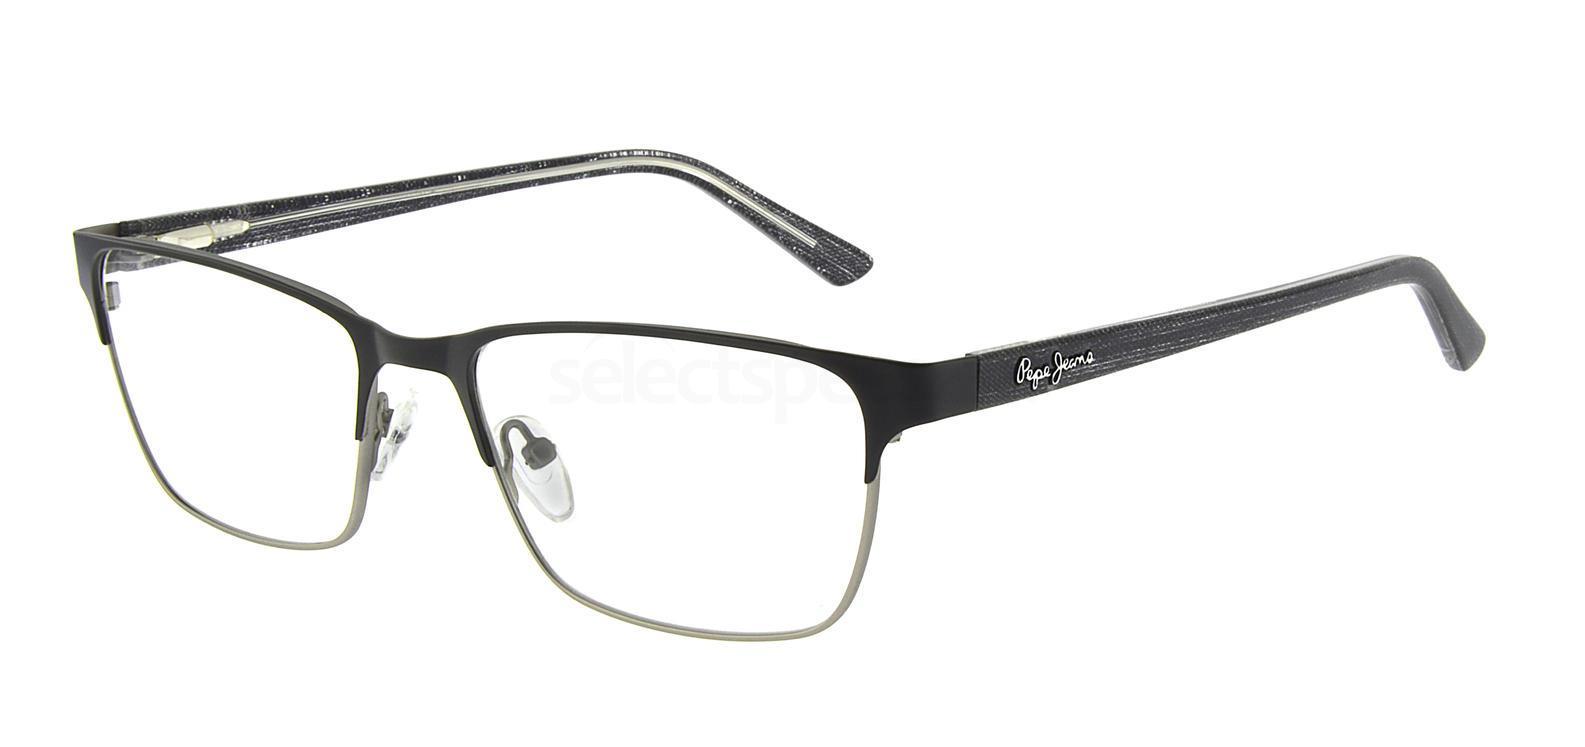 C1 1201 PETE Glasses, Pepe Jeans London